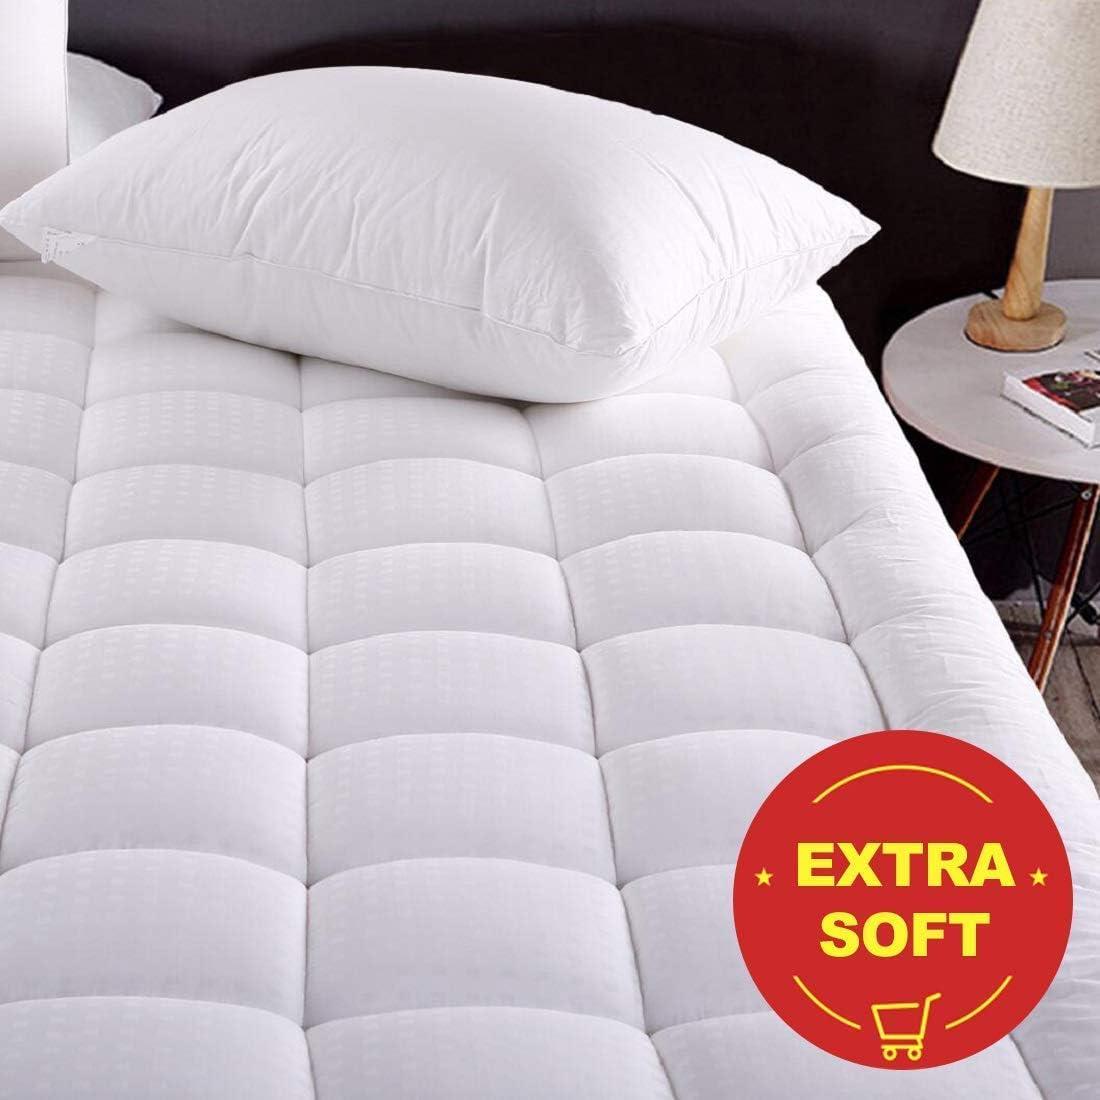 Pillow Top Quilted Mattress Topper,Fitted 8-21 Inch Deep Pocket Mattress Pad Cover MEROUS Queen Size Cotton Mattress Pad